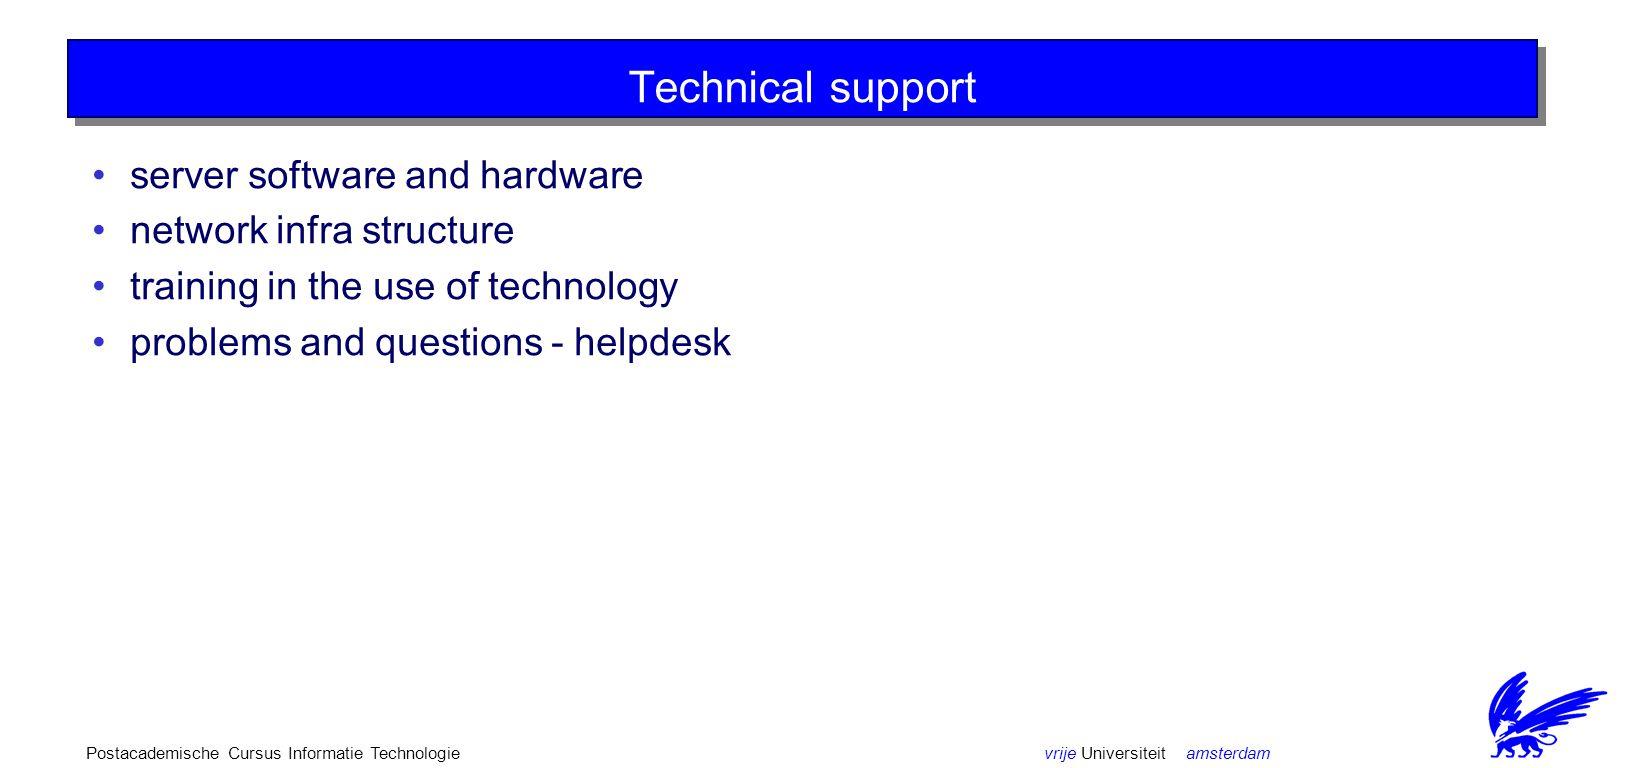 vrije Universiteit amsterdamPostacademische Cursus Informatie Technologie Server software and hardware - Q/A.